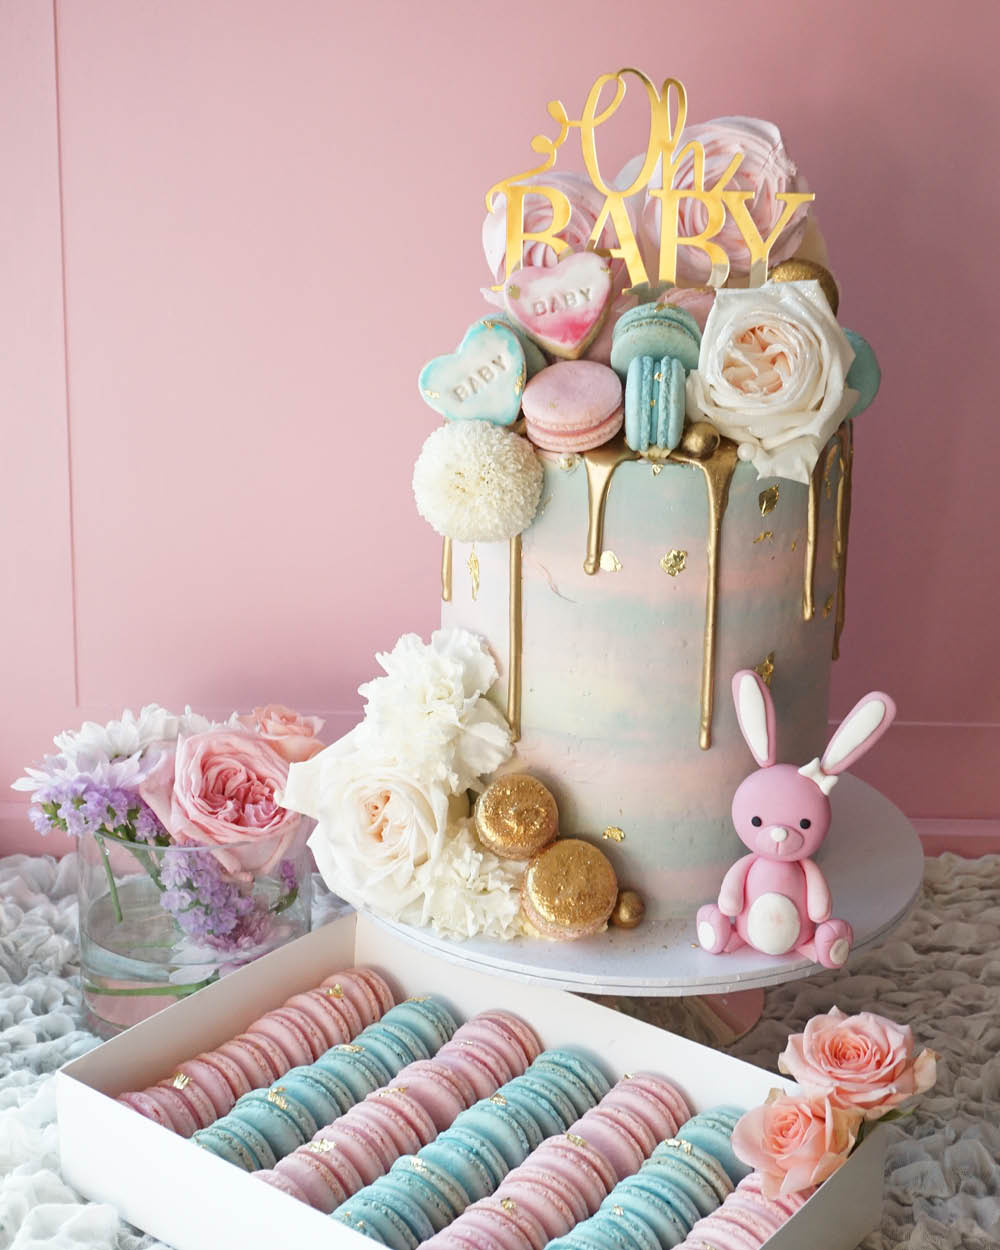 Cakes_By_Aranee_Perth_Drip_Cakes_Custom_Cakes_Wedding_Cakes_Macarons_Cupcakes_Personalised_Cookies_CAKES_Gallery16.jpg